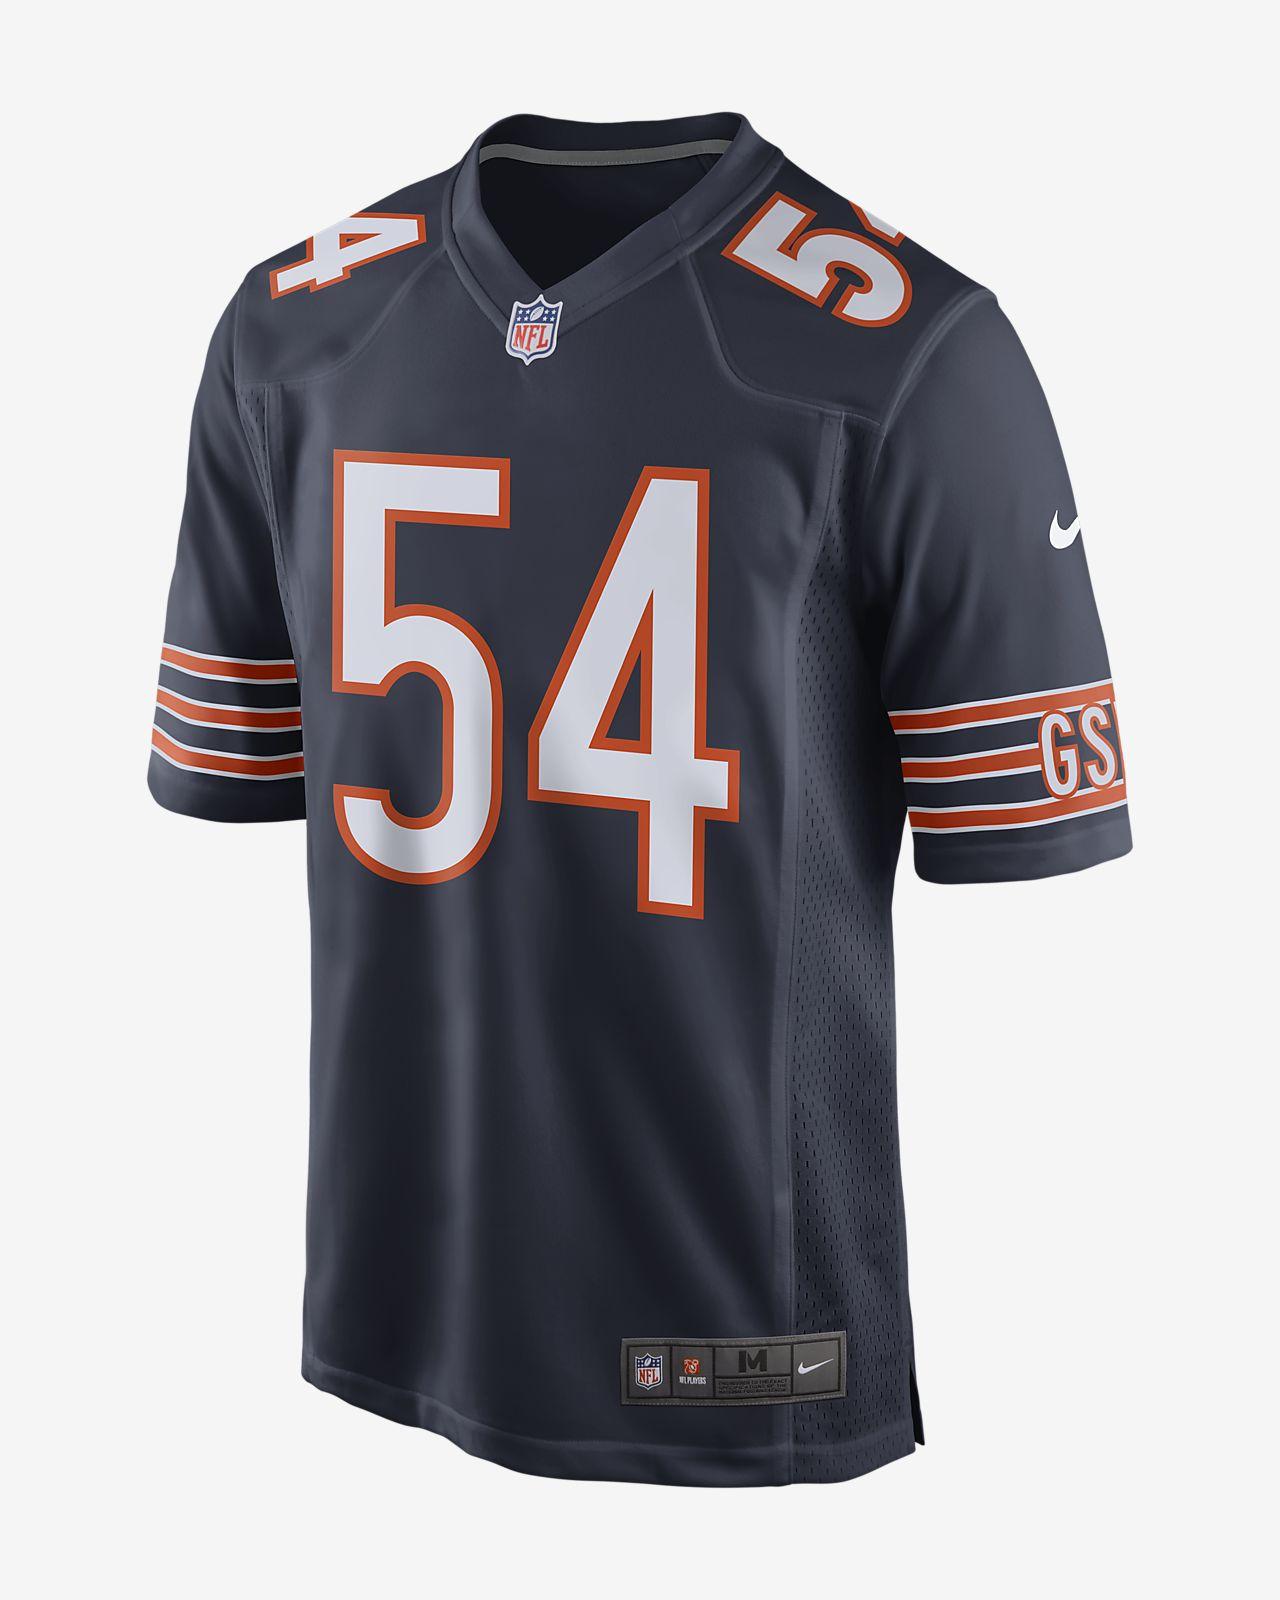 NFL Chicago Bears (Brian Urlacher) Men's Football Home Game Jersey